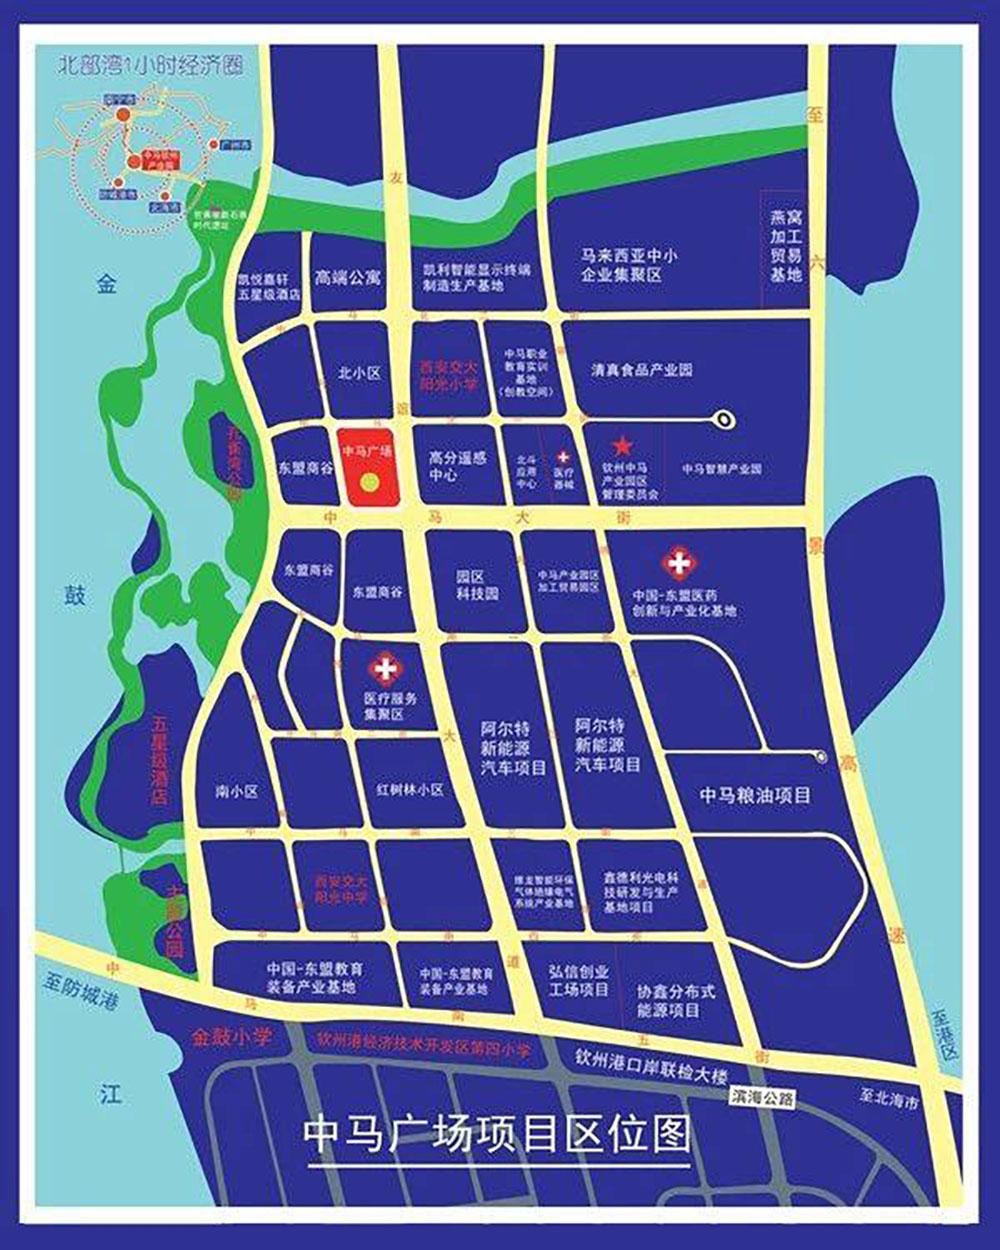 http://yuefangwangimg.oss-cn-hangzhou.aliyuncs.com/uploads/20210531/a24d9e5be632231c5818630e7e2ad869Max.jpg